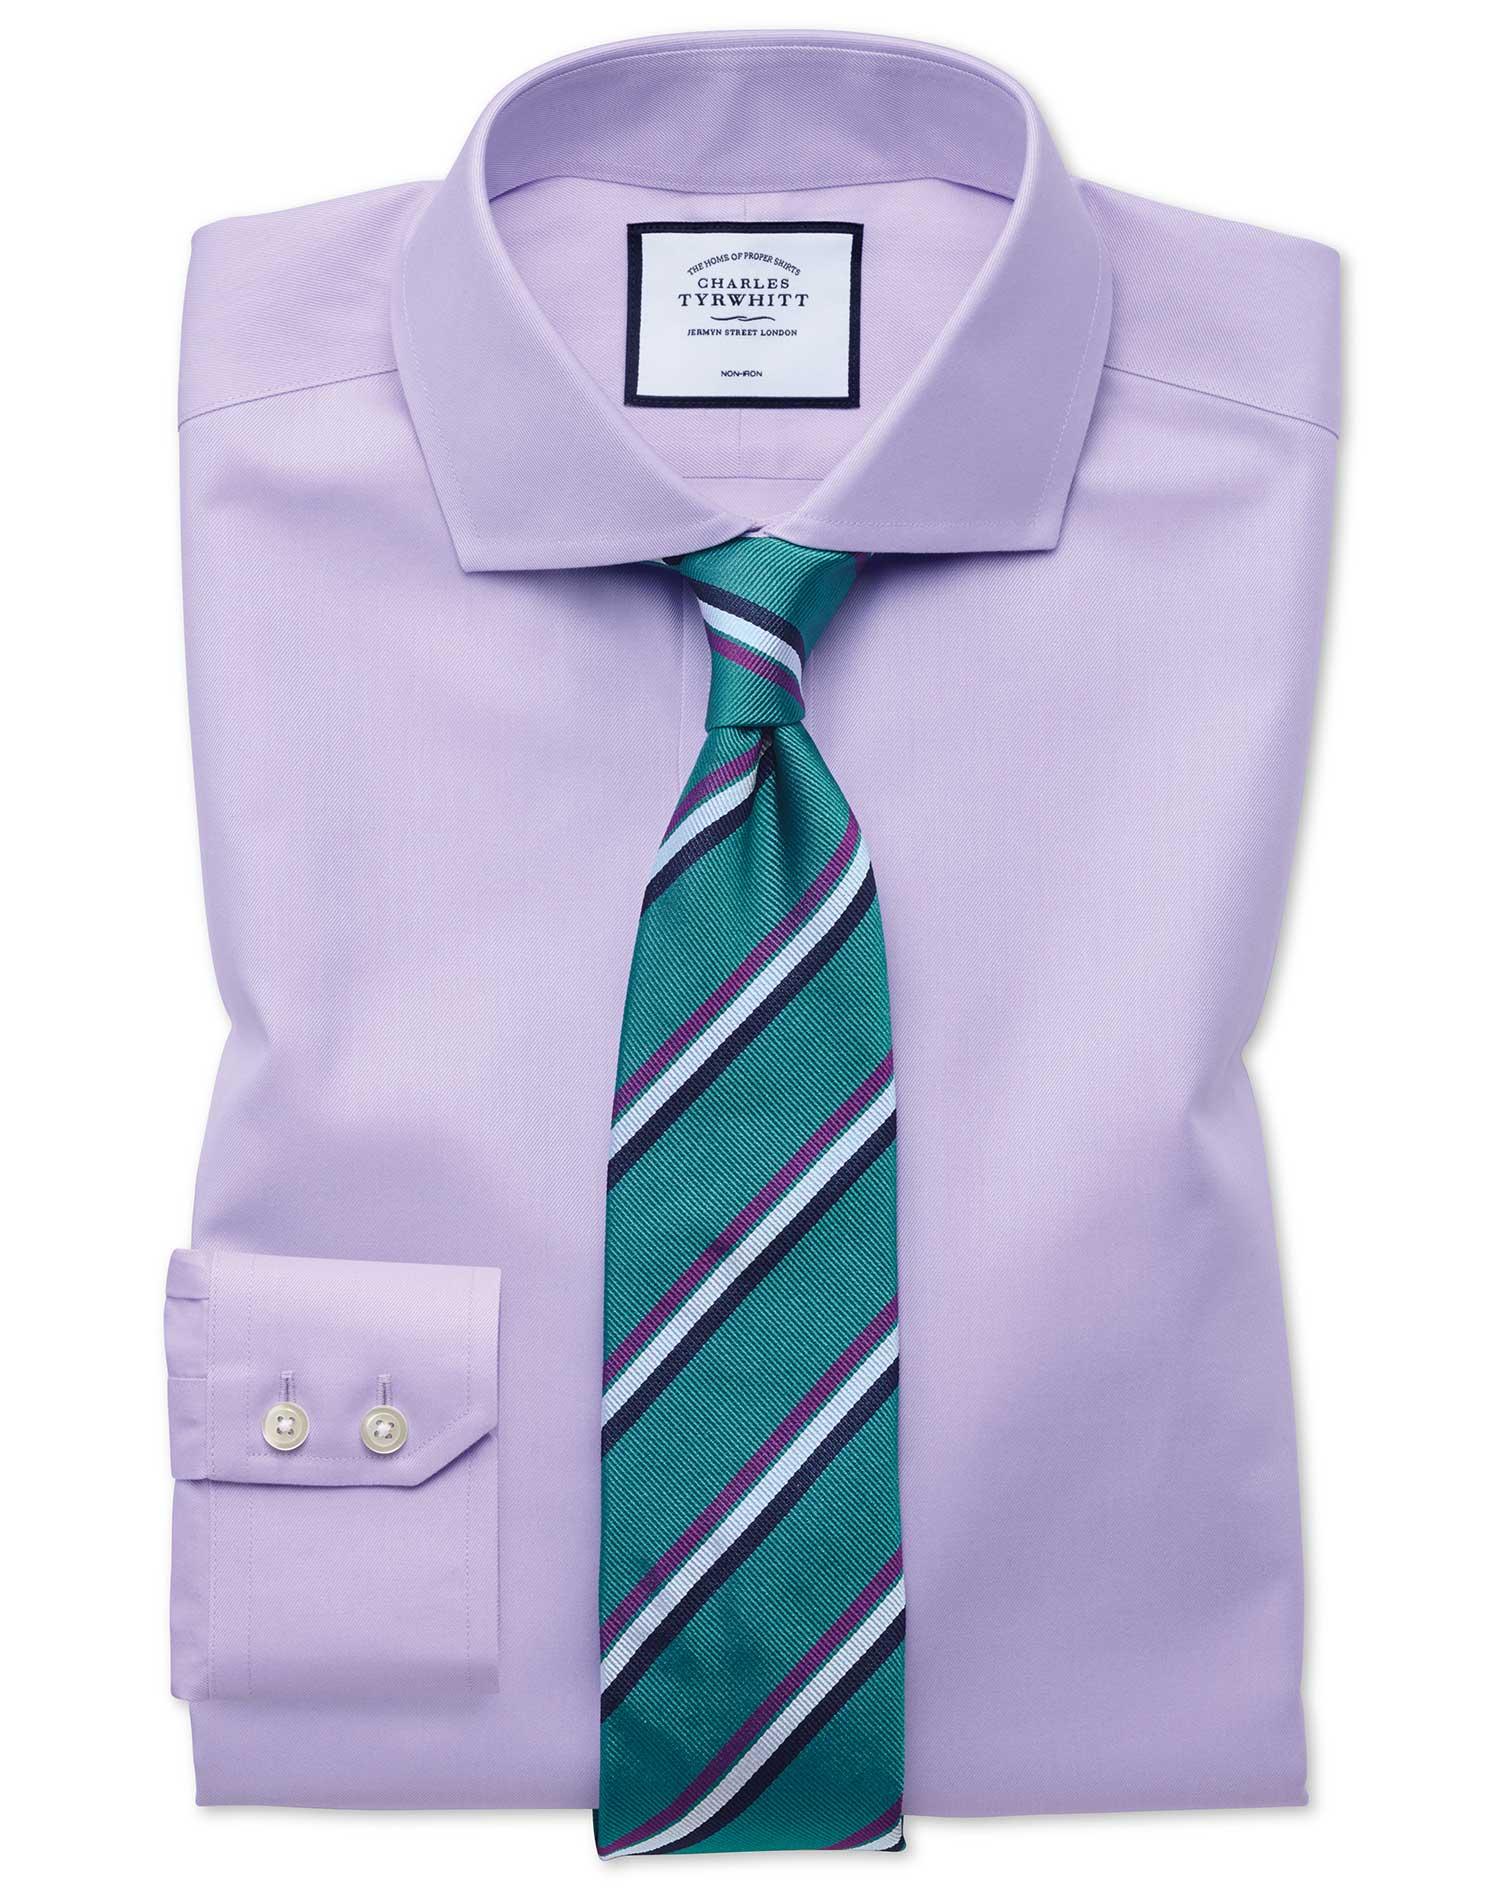 Cotton Slim Fit Non-Iron Twill Lilac Cutaway Collar Shirt